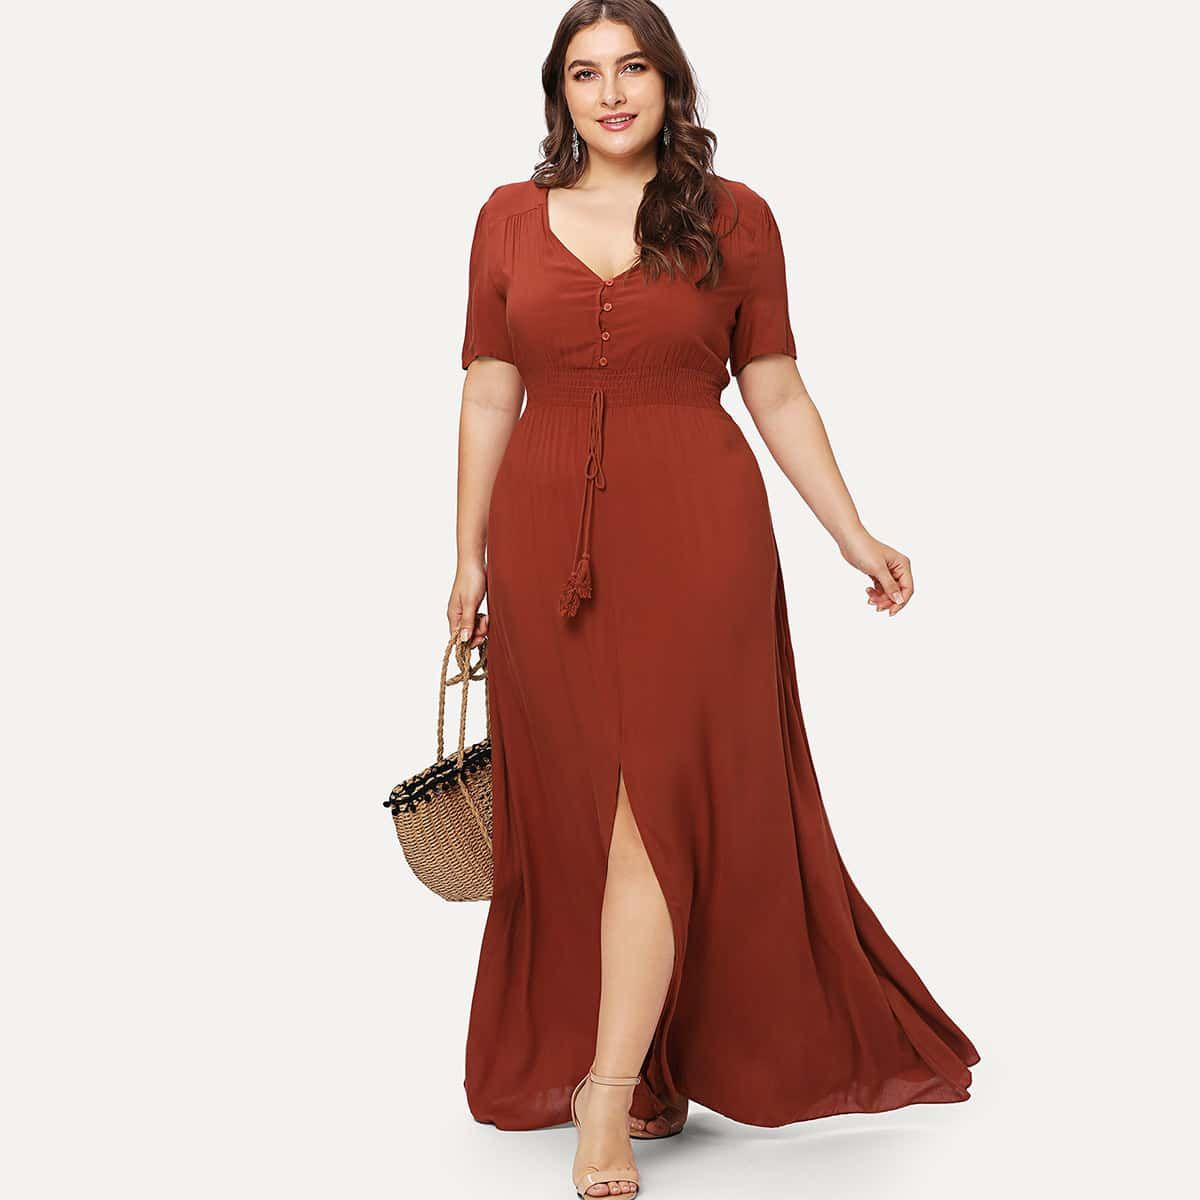 21 00 Vestido Bajo Con Abertura De Cintura Fruncido Shein Tallas Grandes Mujer Vestidos Plus Size Dresses Plus Size Maxi Dresses Flare Dress